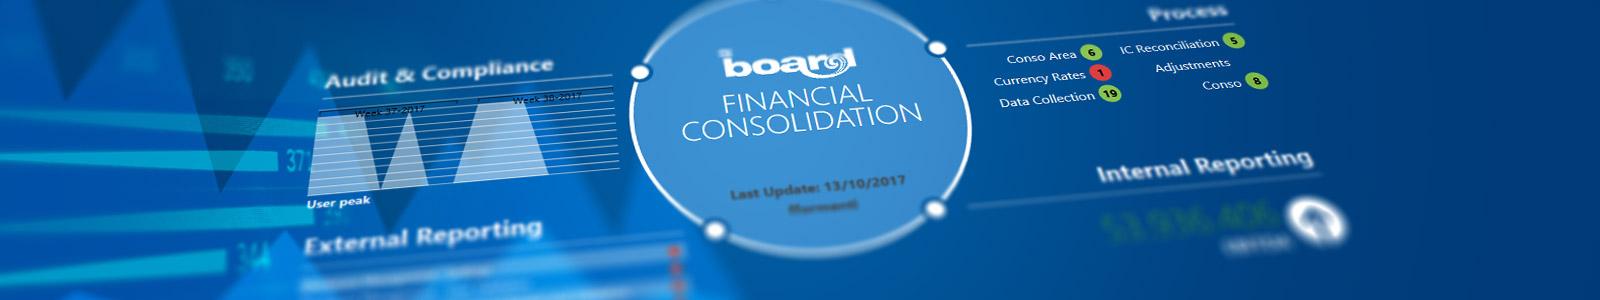 BOARD Financial Consolidation 4.0